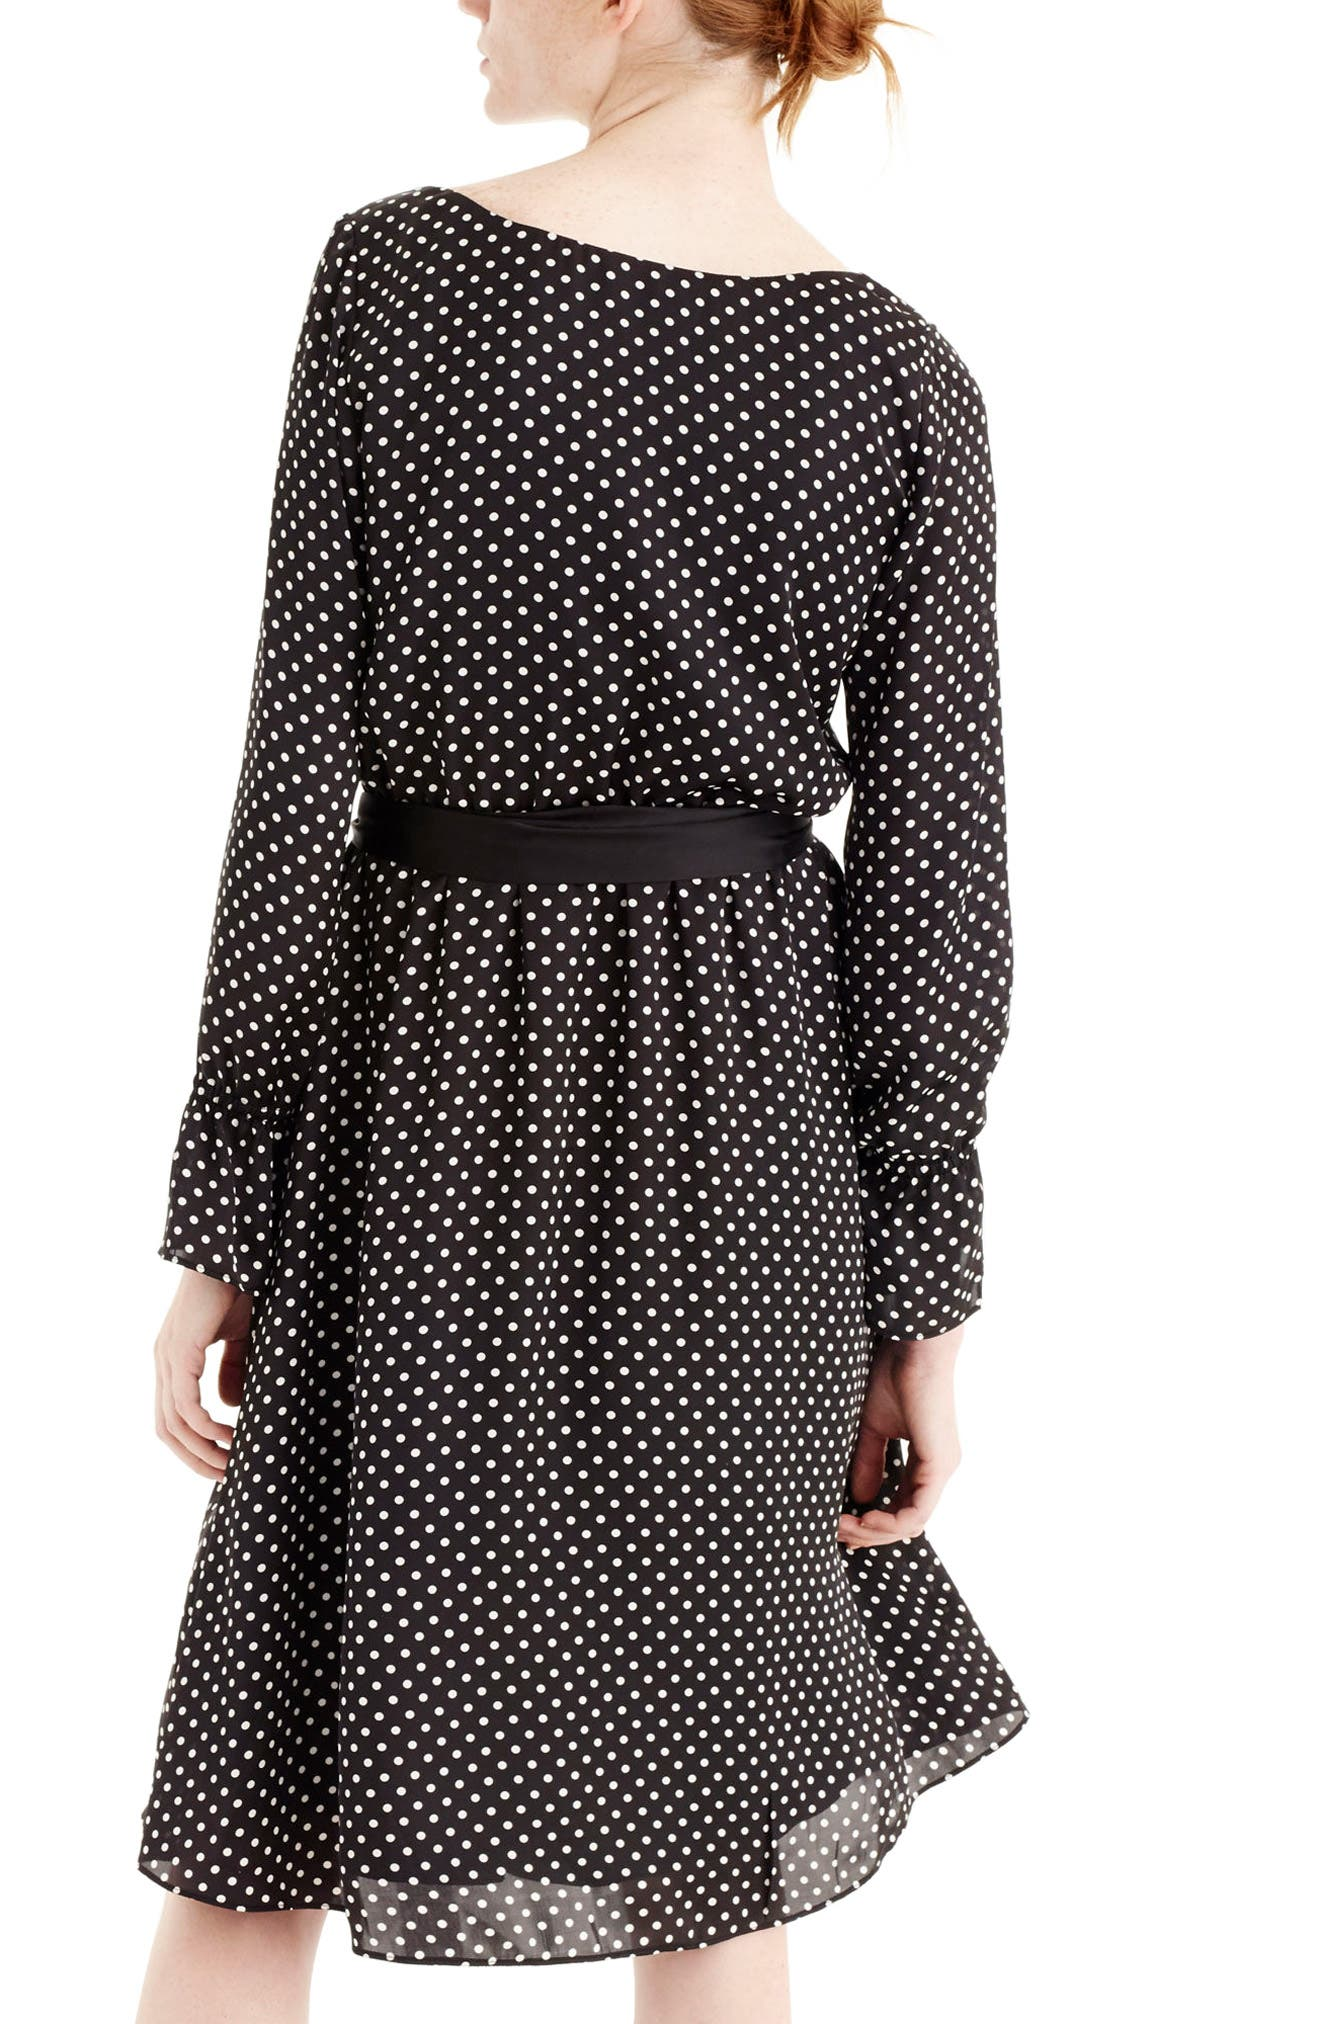 Long Sleeve Polka Dot Dress,                             Alternate thumbnail 2, color,                             009